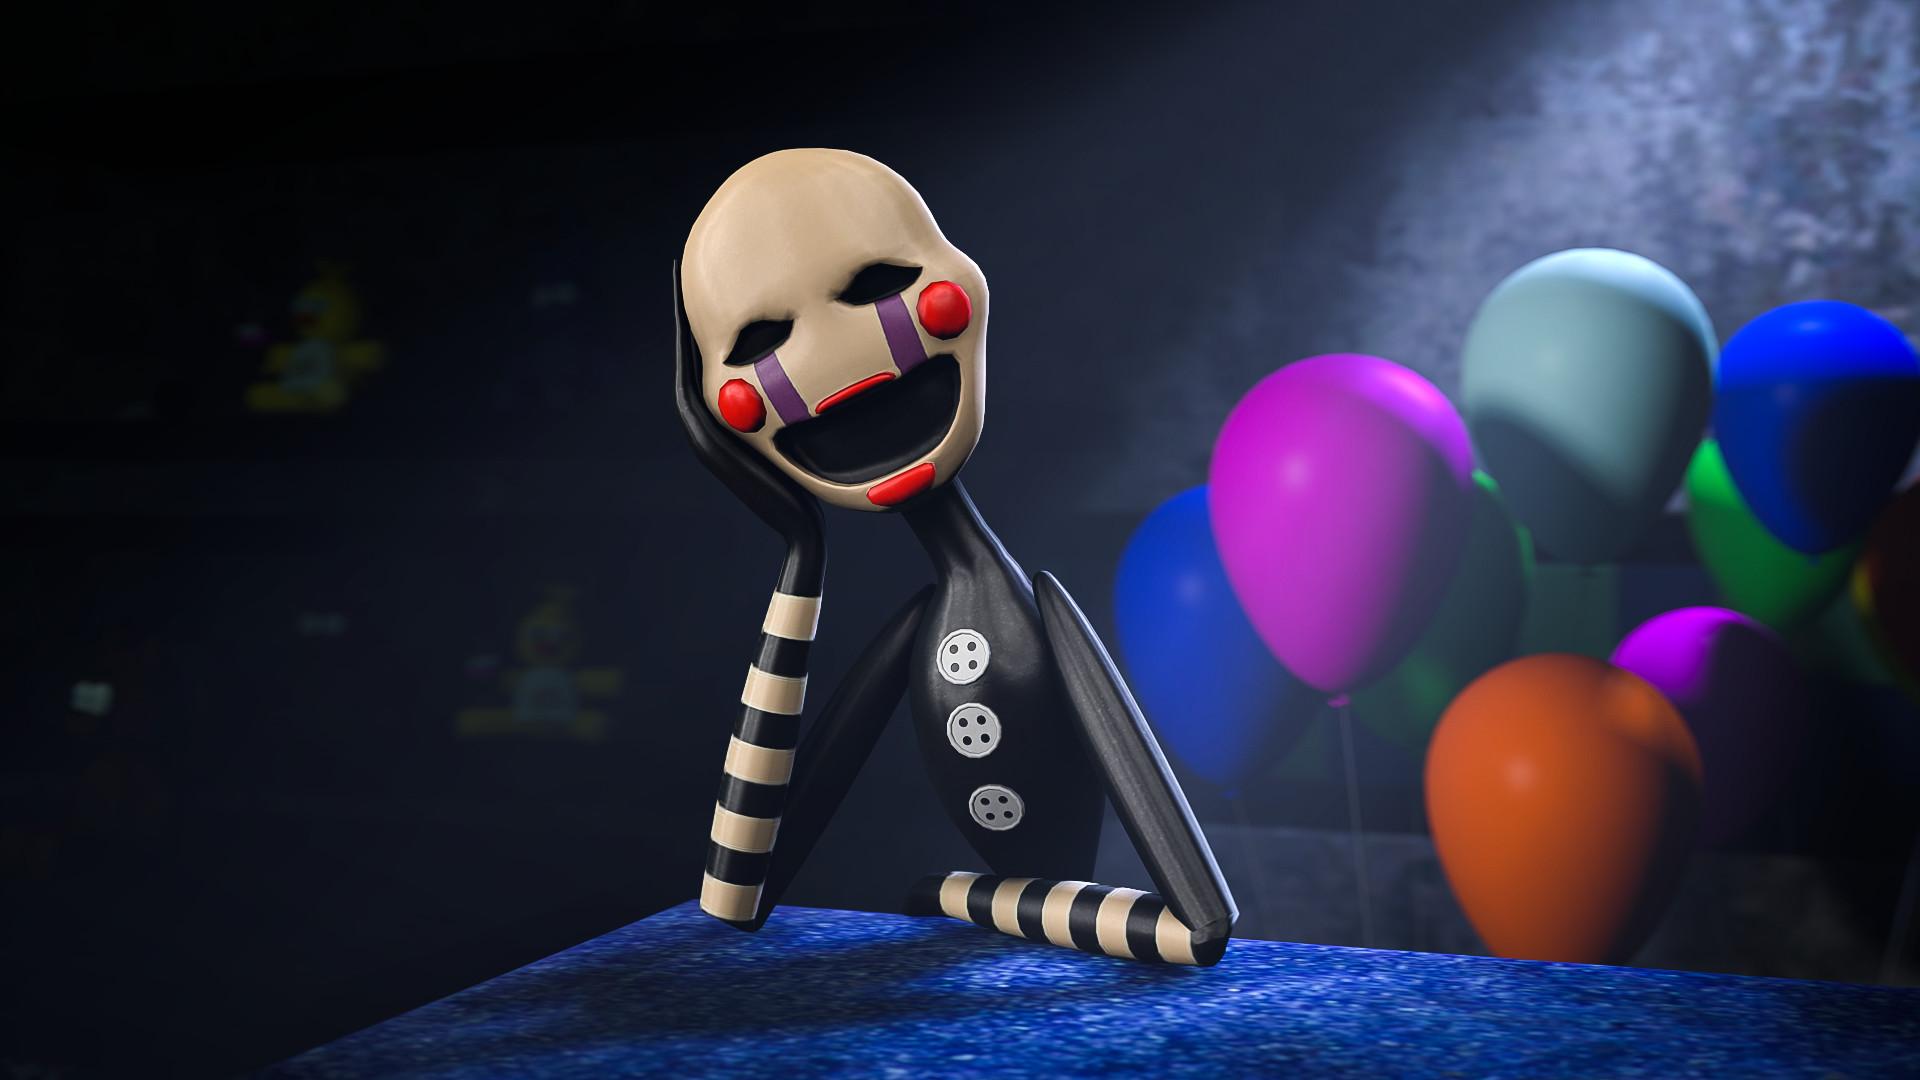 Marionette Live Wallpaper